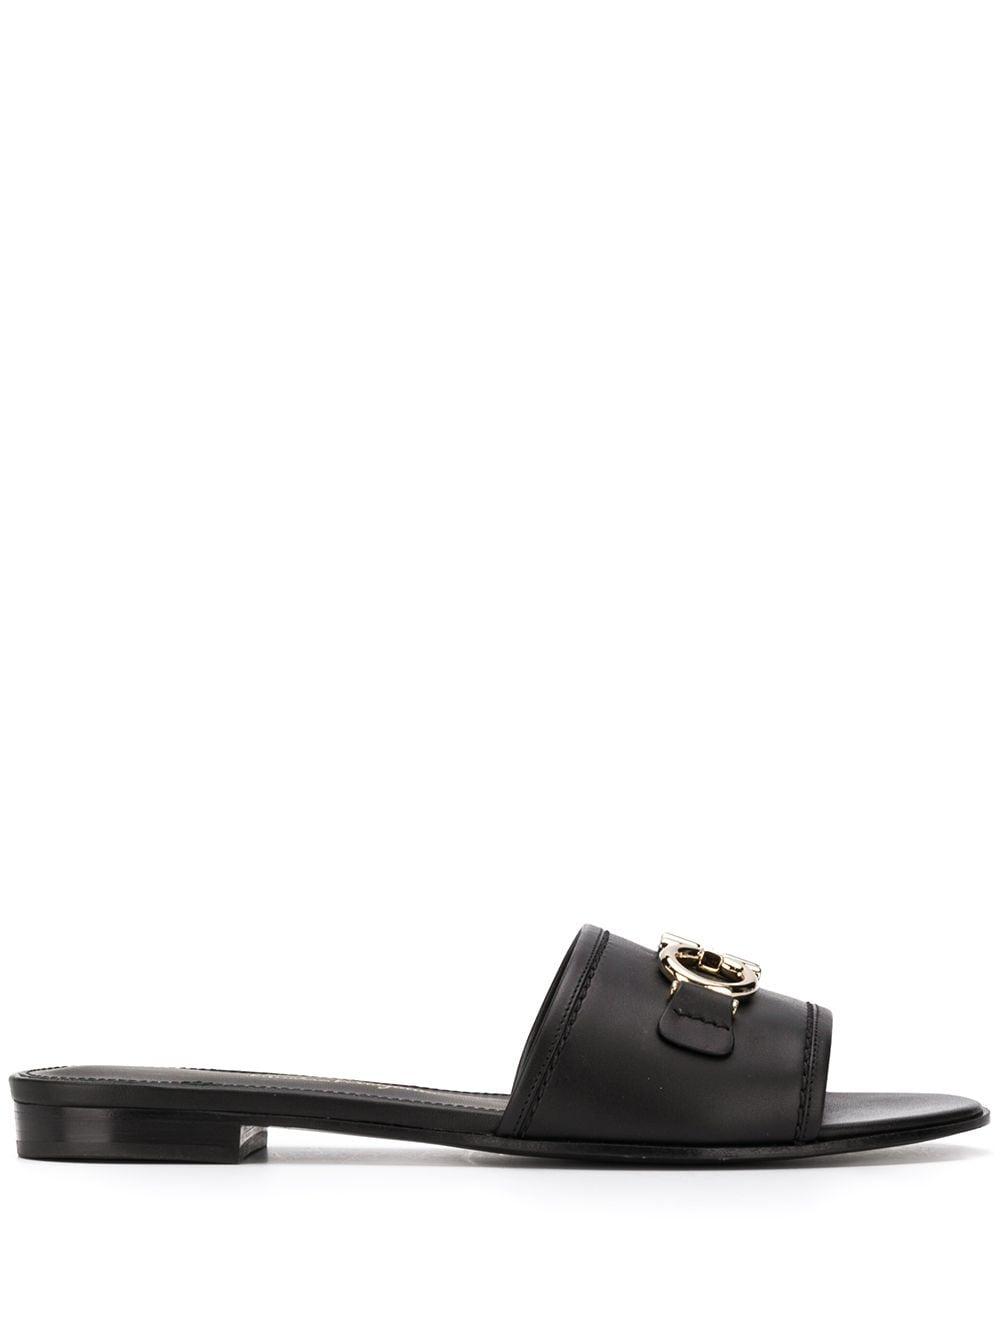 Rhodes Leather Sandals